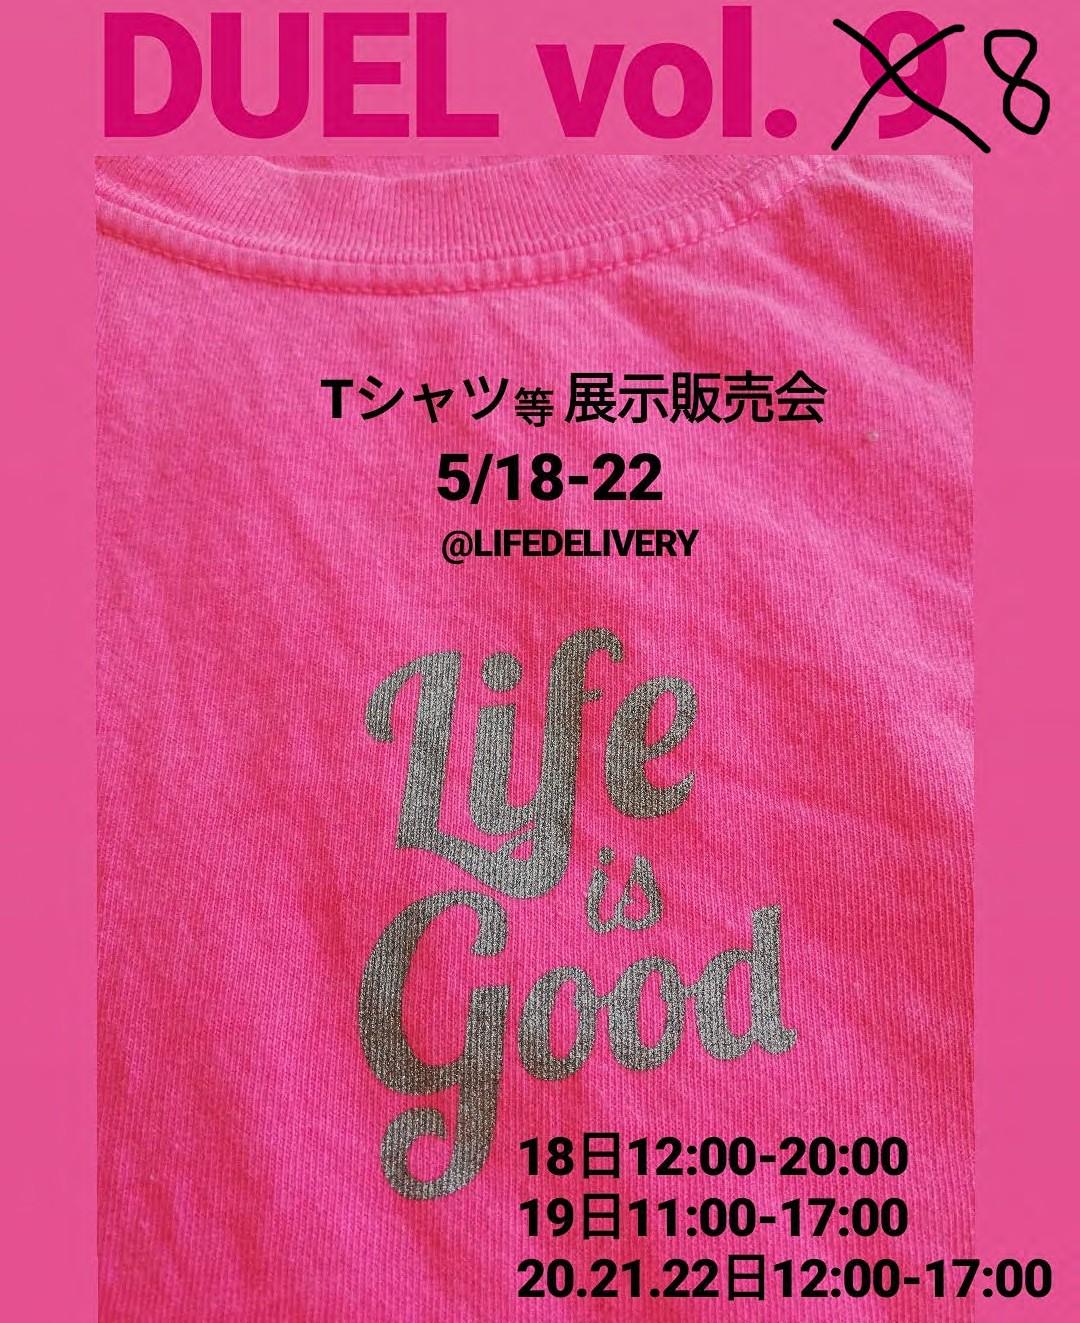 DUEL vol.8 Tシャツ展示販売会 5/18-22